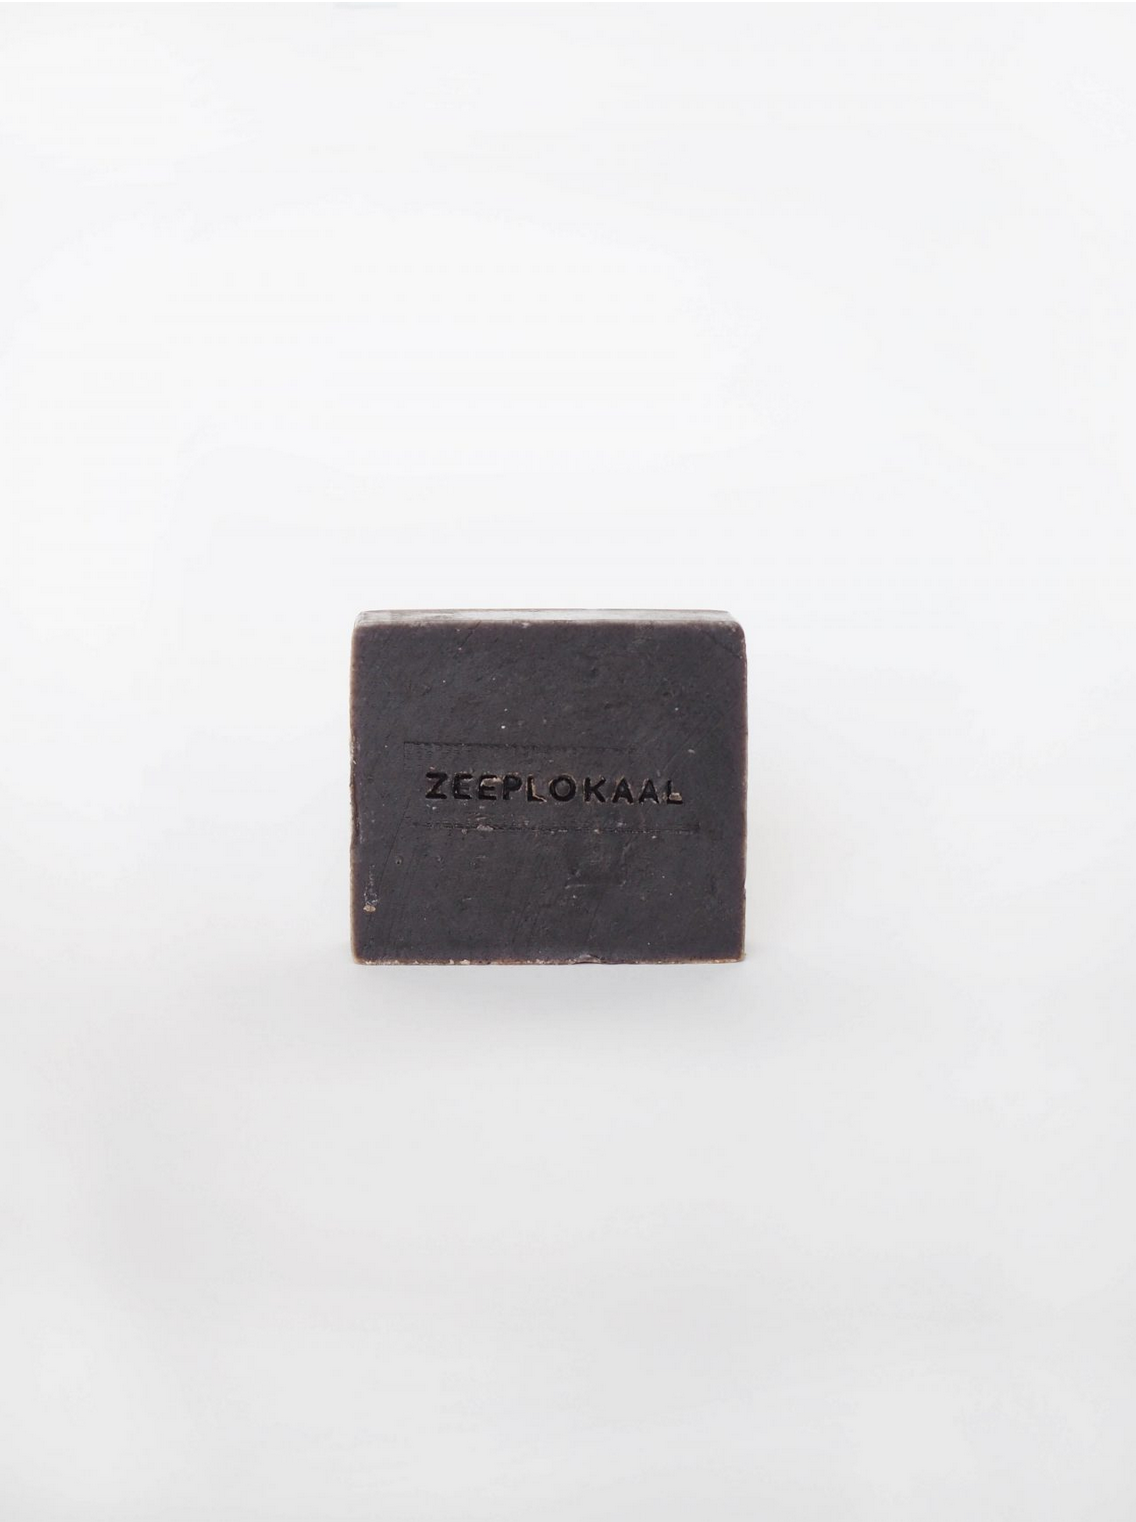 Shampoo Bar - Aroniabes & Rozemarijn - Zeeplokaal-1